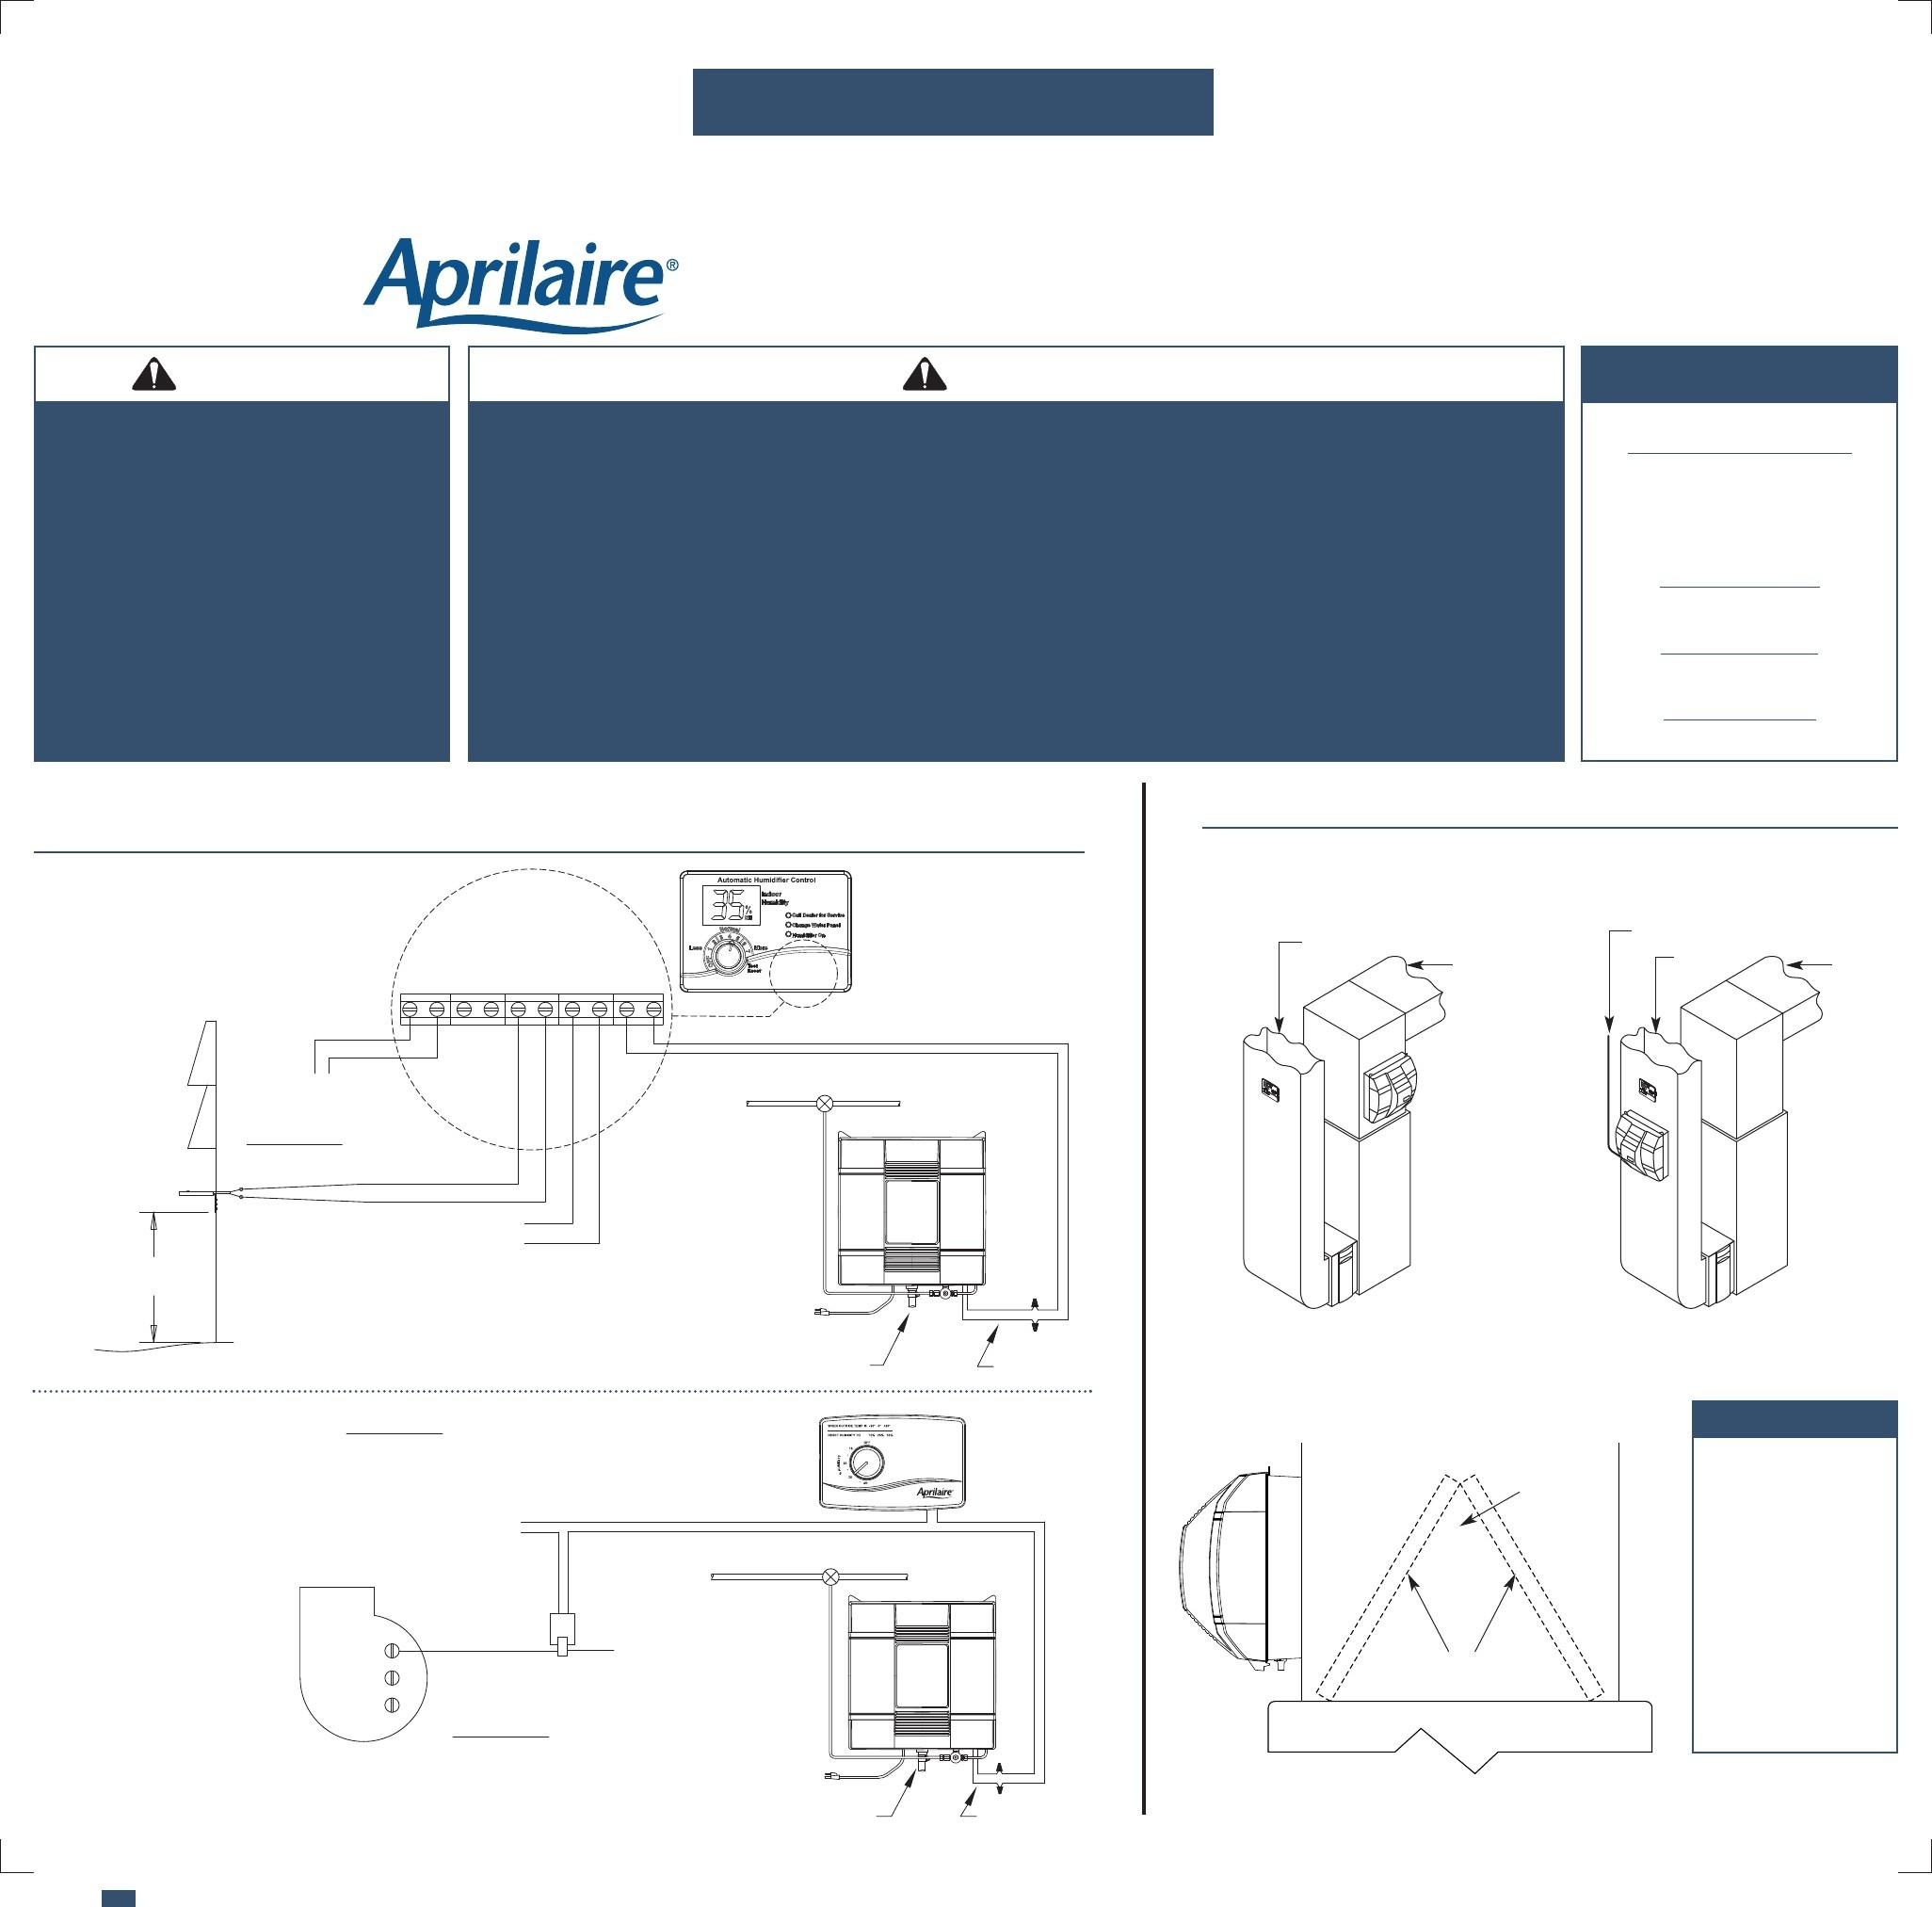 aprilaire 56 humidistat wiring diagram free wiring diagram. Black Bedroom Furniture Sets. Home Design Ideas